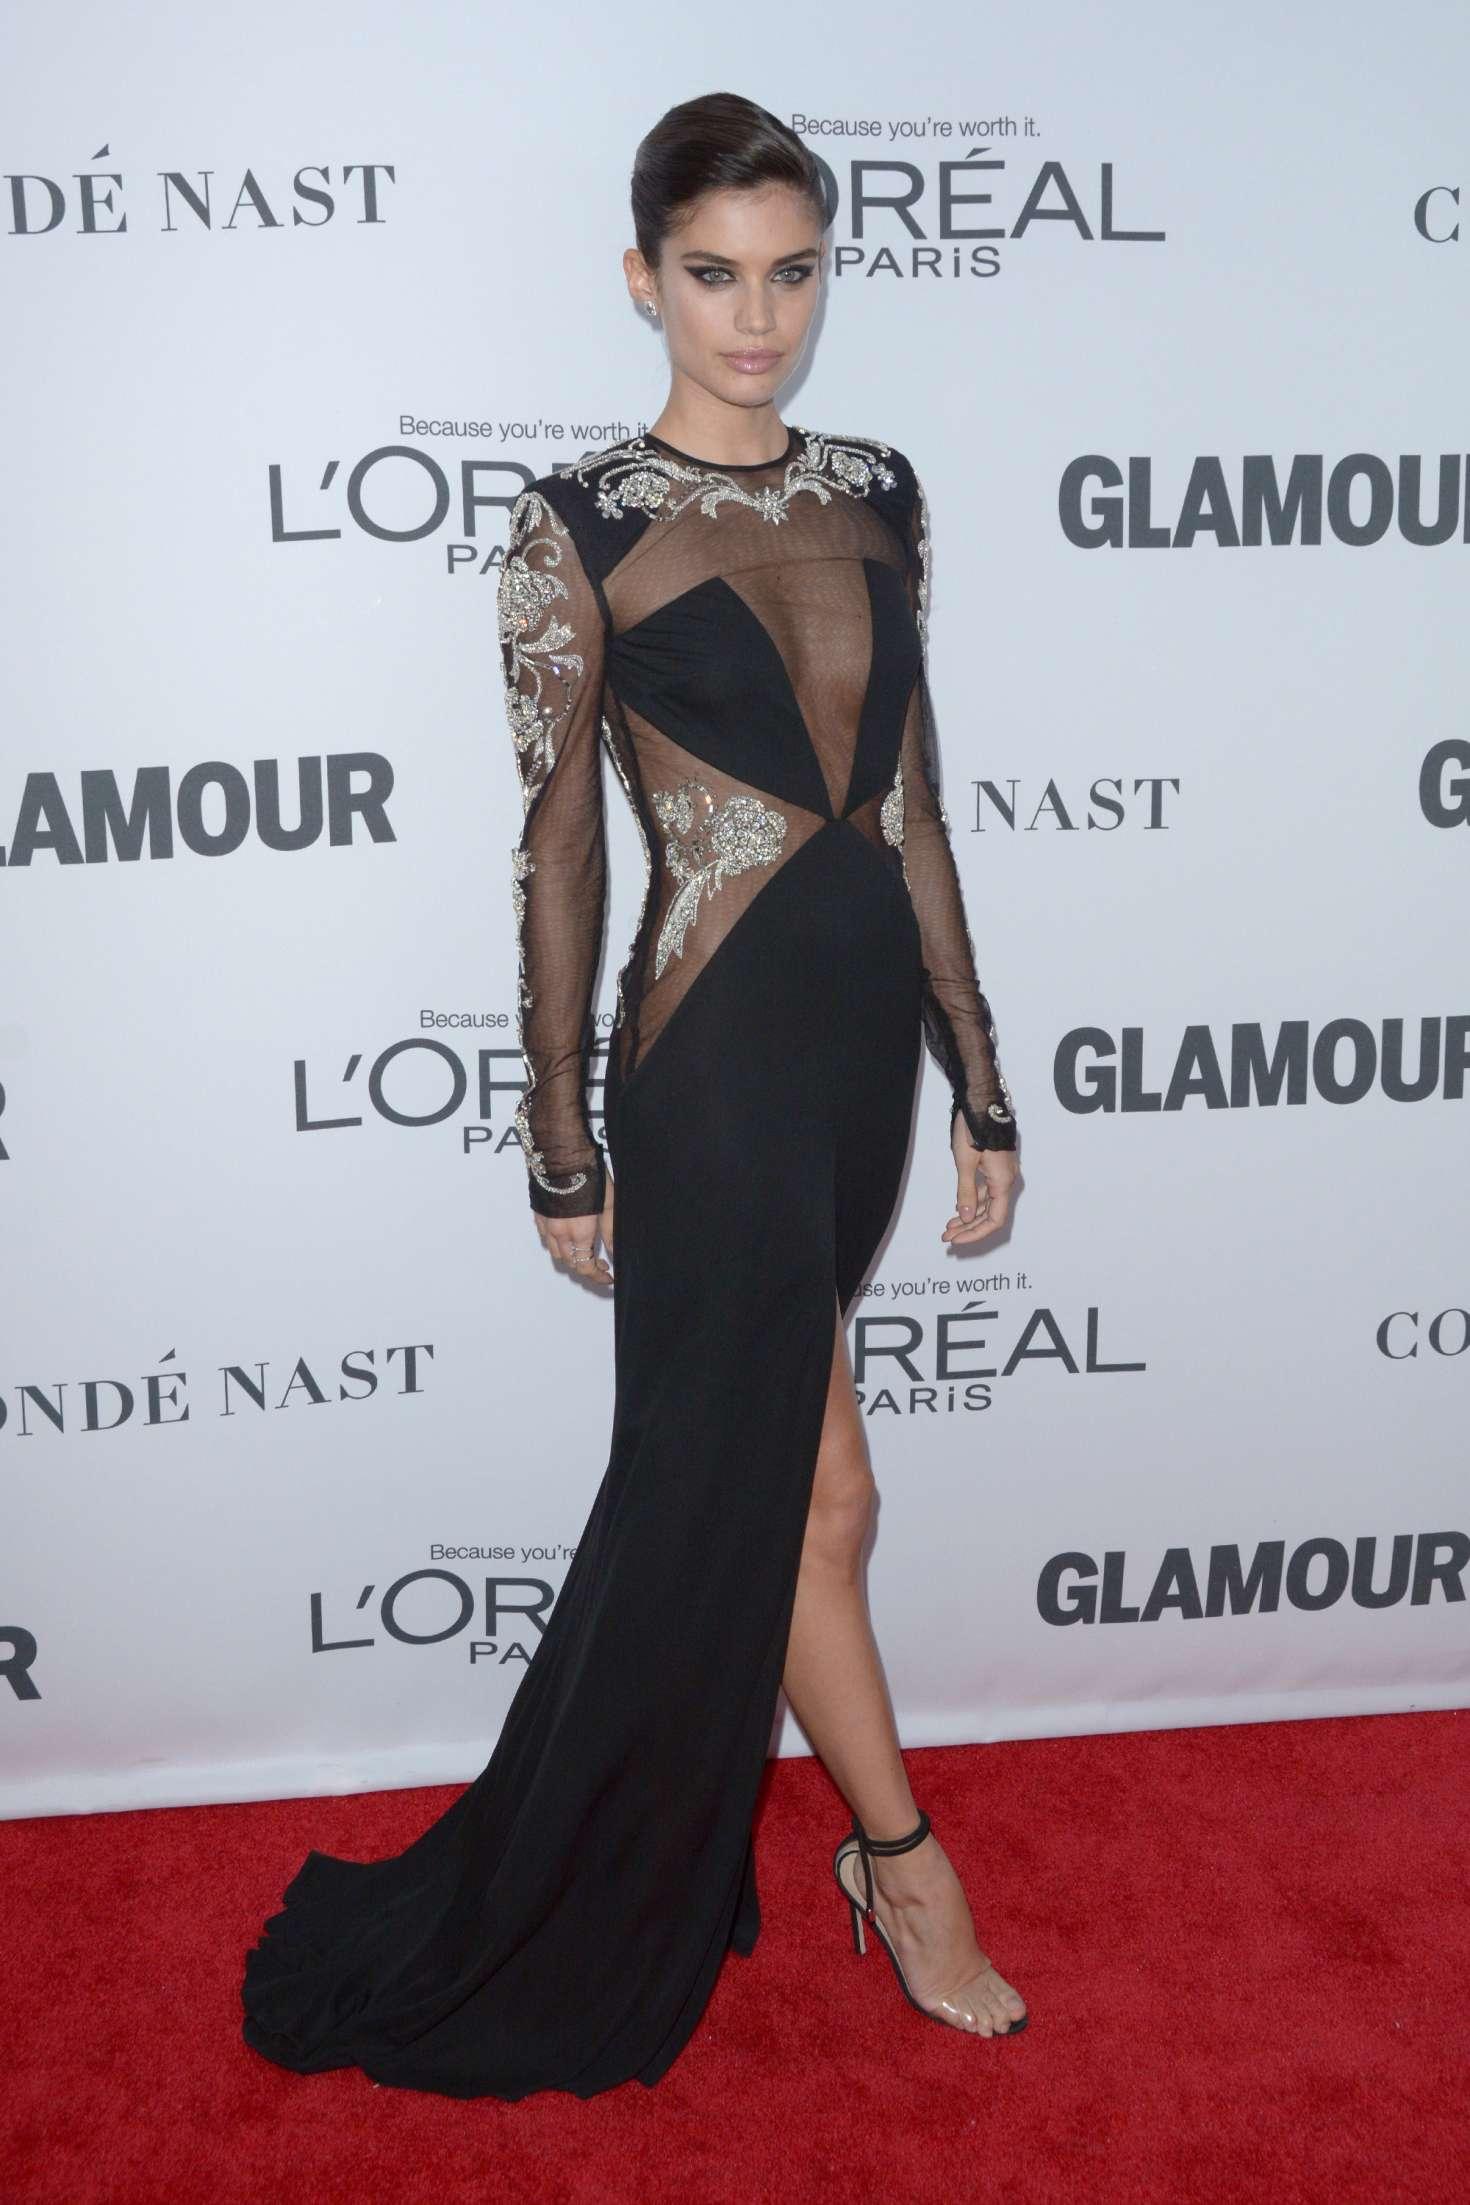 Sara Sampaio 2017 : Sara Sampaio: 2017 Glamour Women of The Year Awards -15